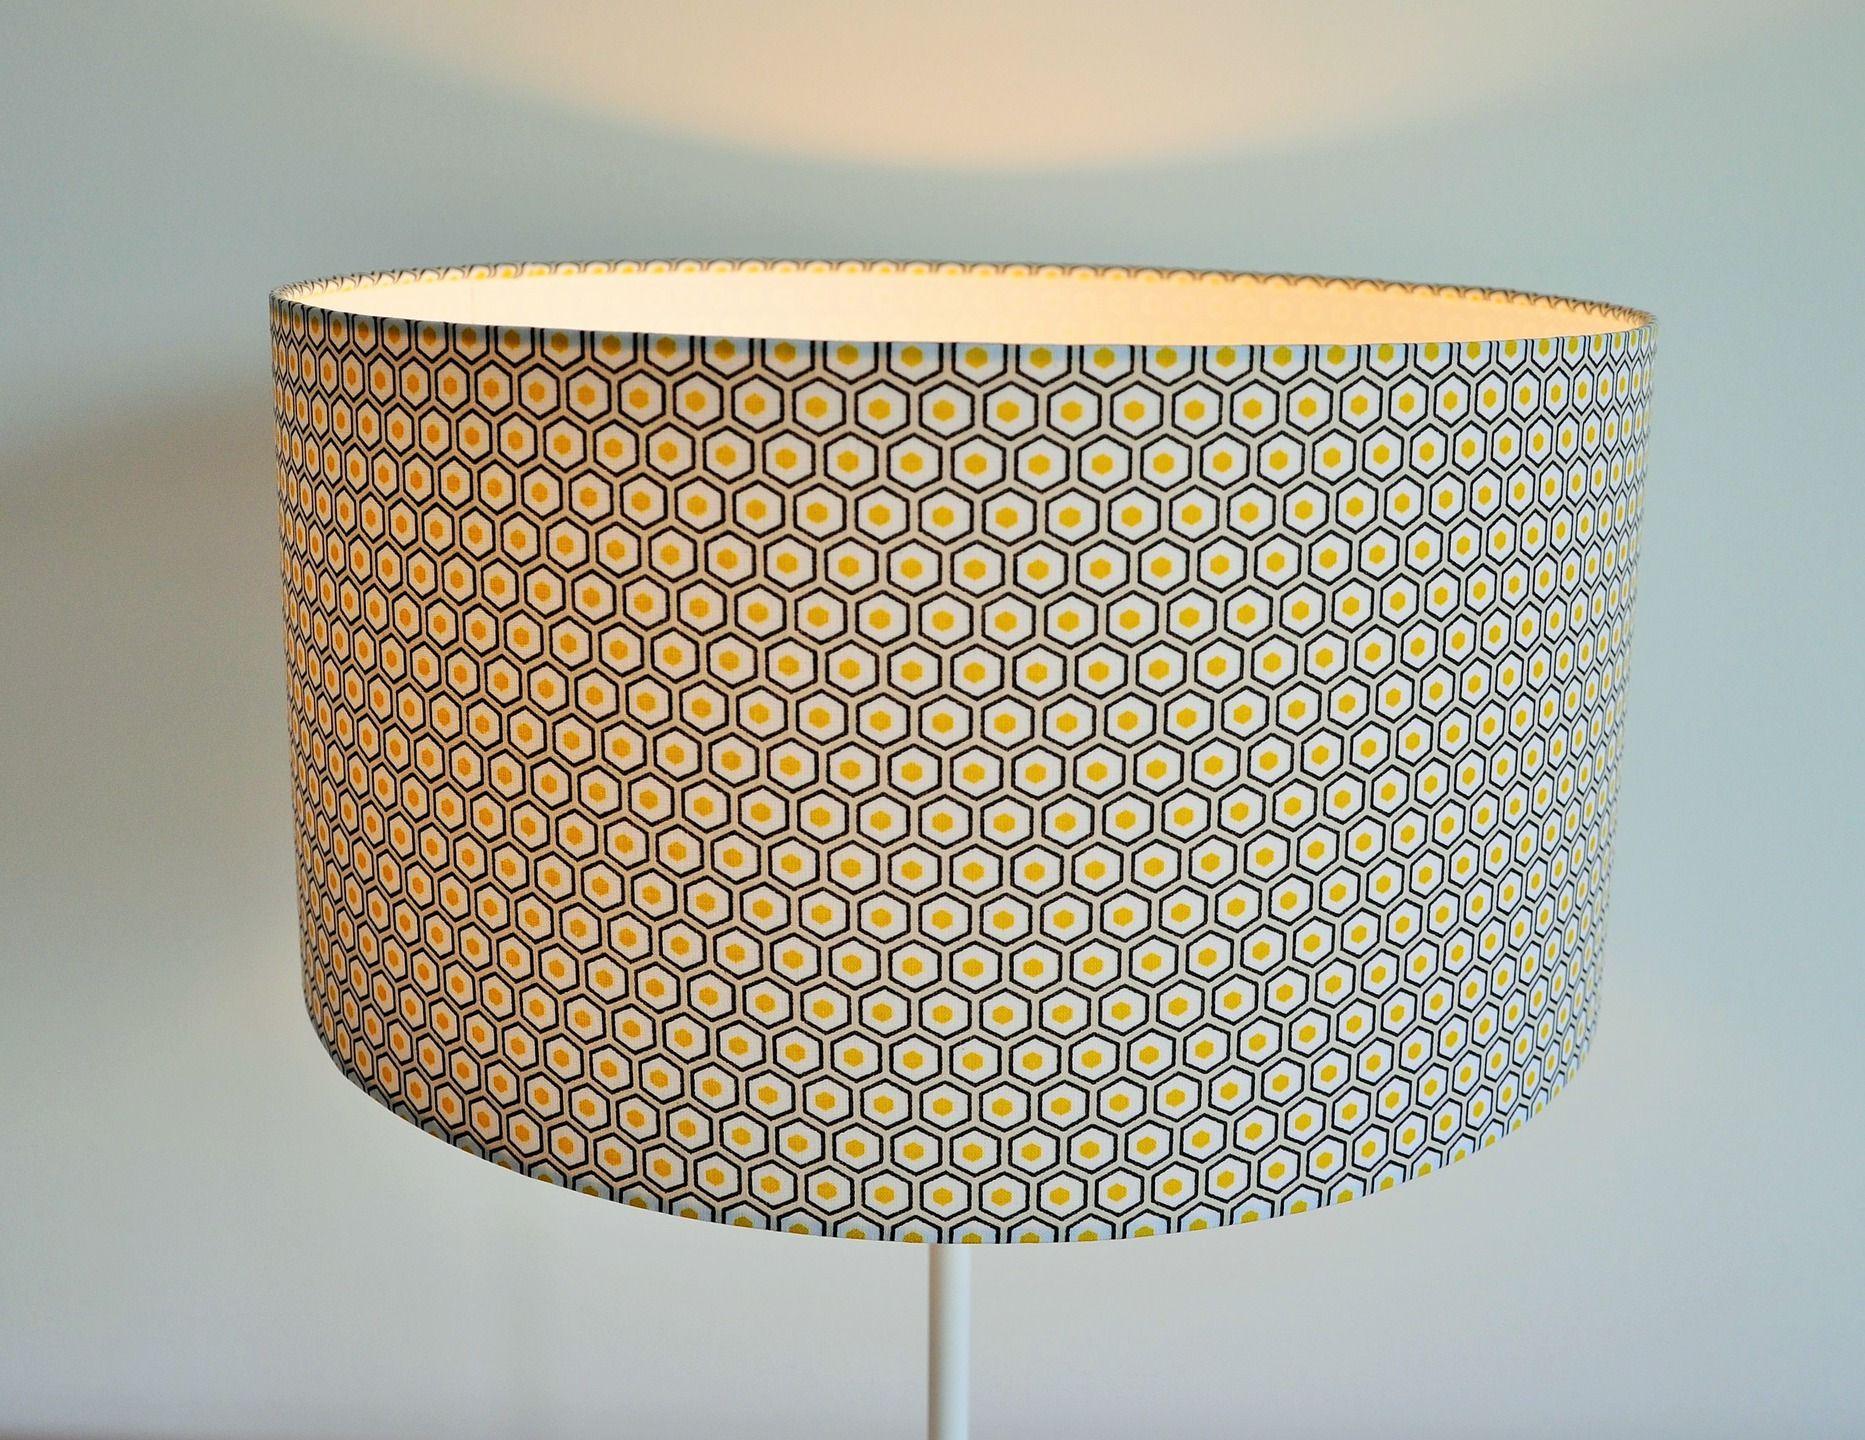 abat jour suspension diam tre 30 cm cylindrique jaune. Black Bedroom Furniture Sets. Home Design Ideas